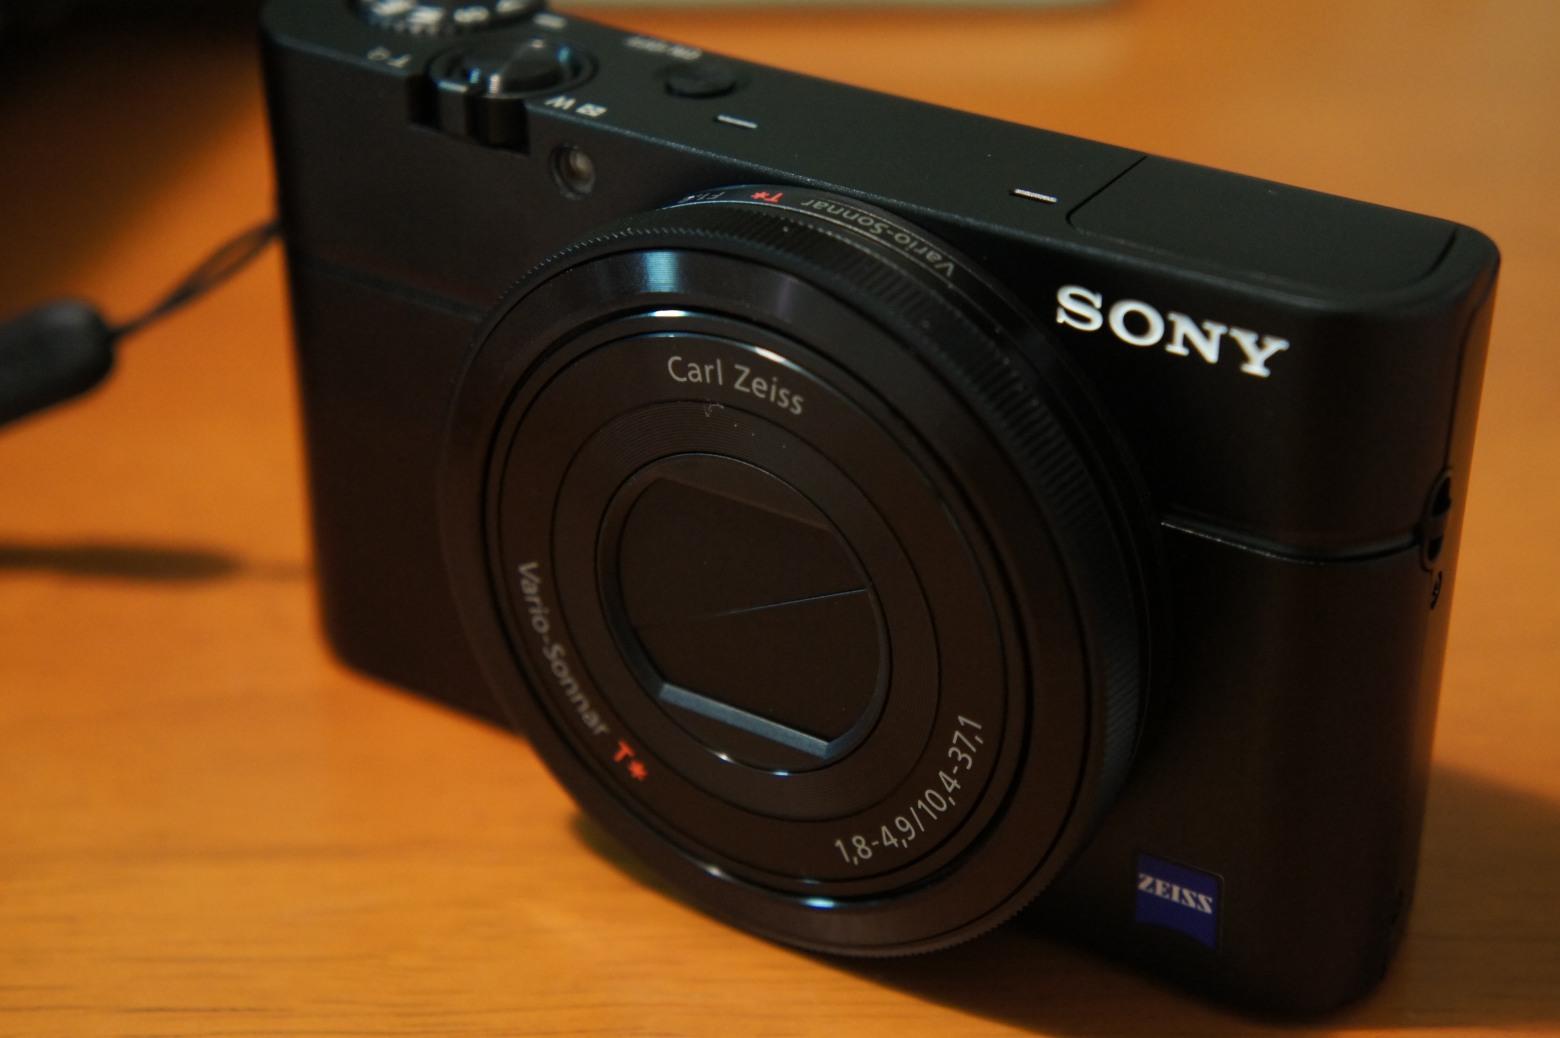 Sony cyber shot programa baixar fotos 36